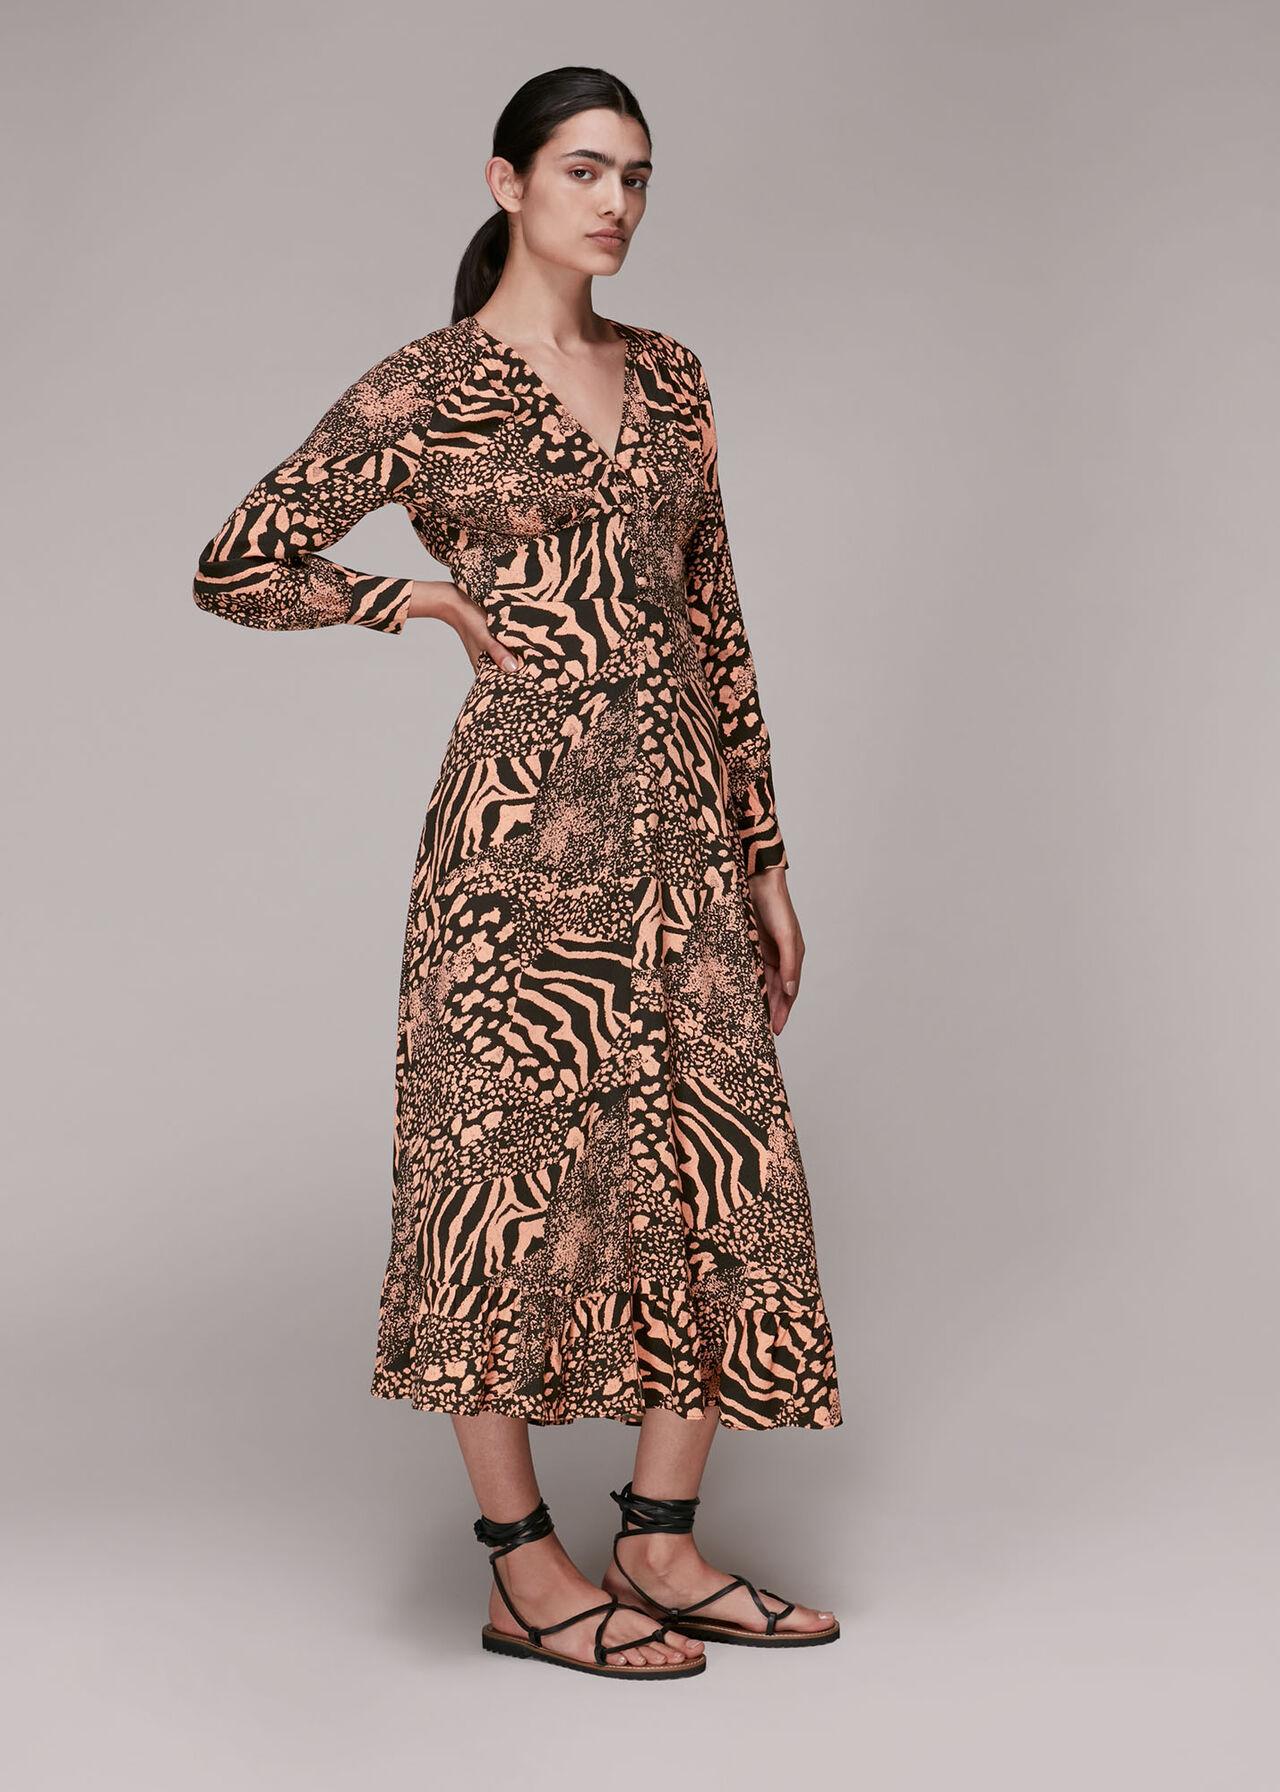 Patchwork Animal Midi Dress